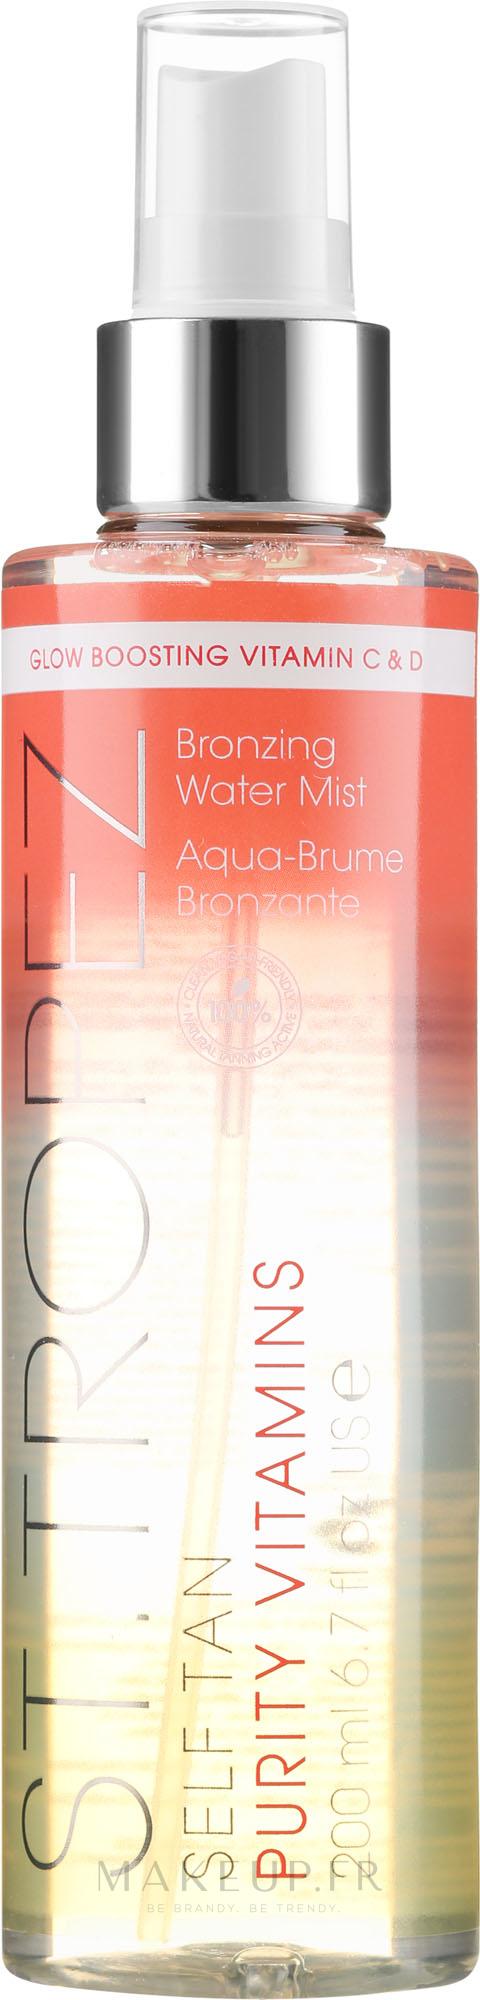 Brume auto-bronzante aux vitamines C et D pour corps - St. Tropez Self Tan Purity Vitamins Bronzing Water Body Mist — Photo 200 ml